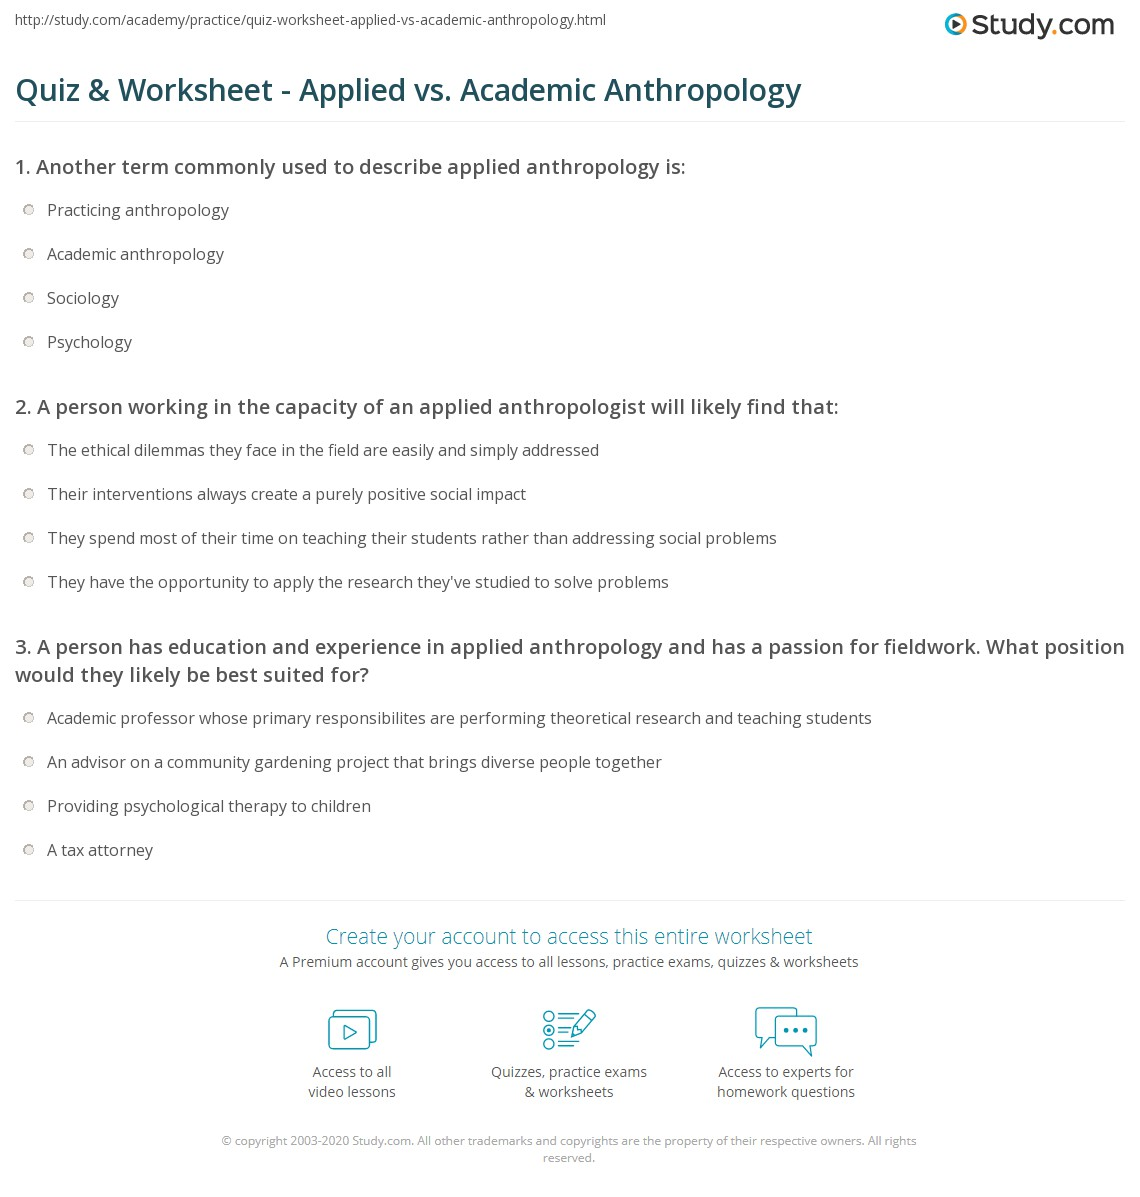 Quiz & Worksheet - Applied vs. Academic Anthropology | Study.com